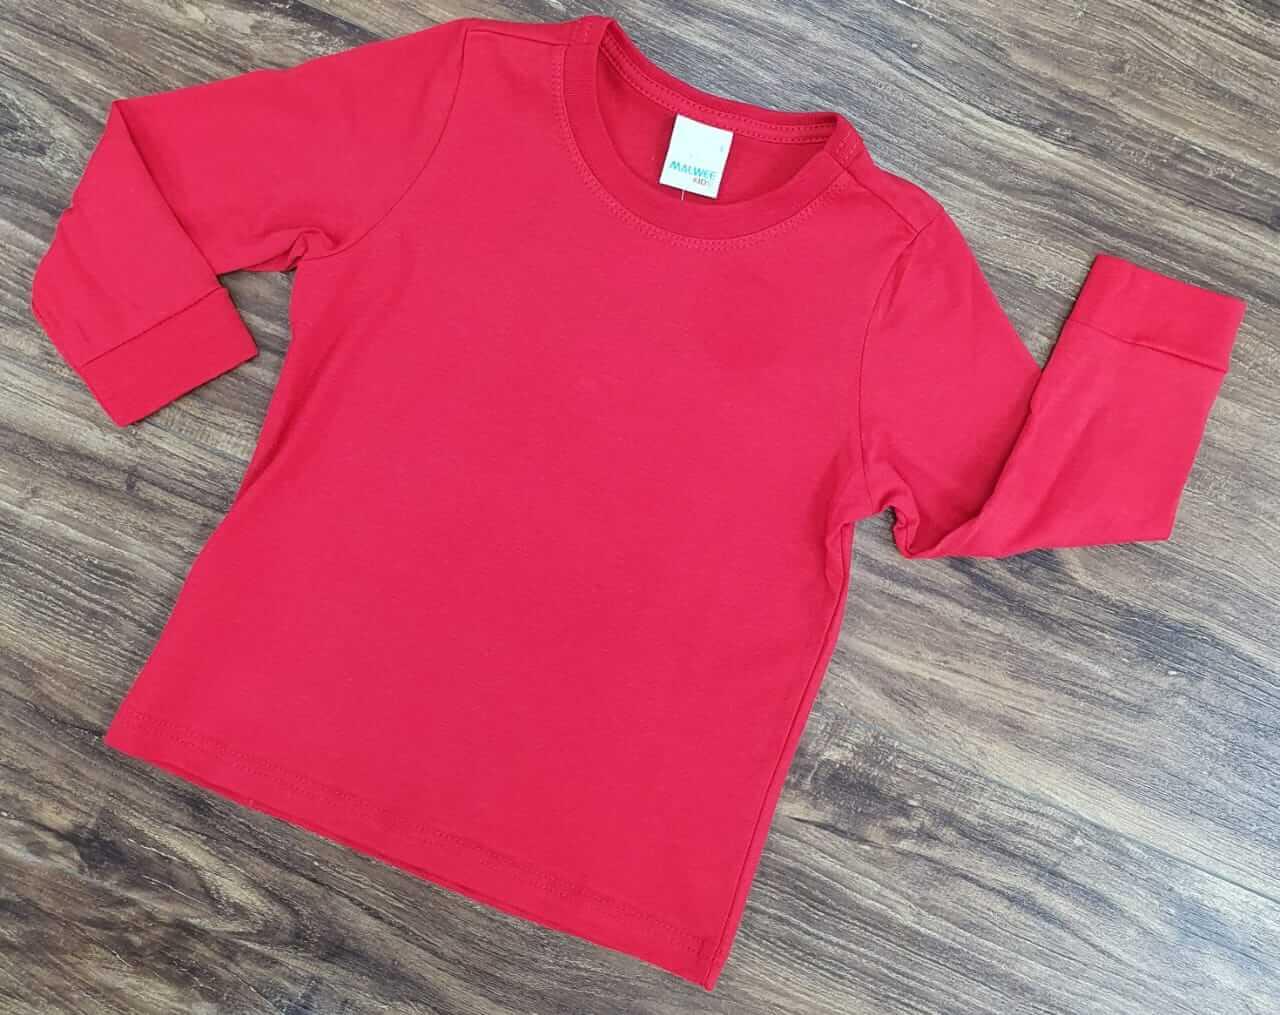 Camiseta Vermelha Manga Longa